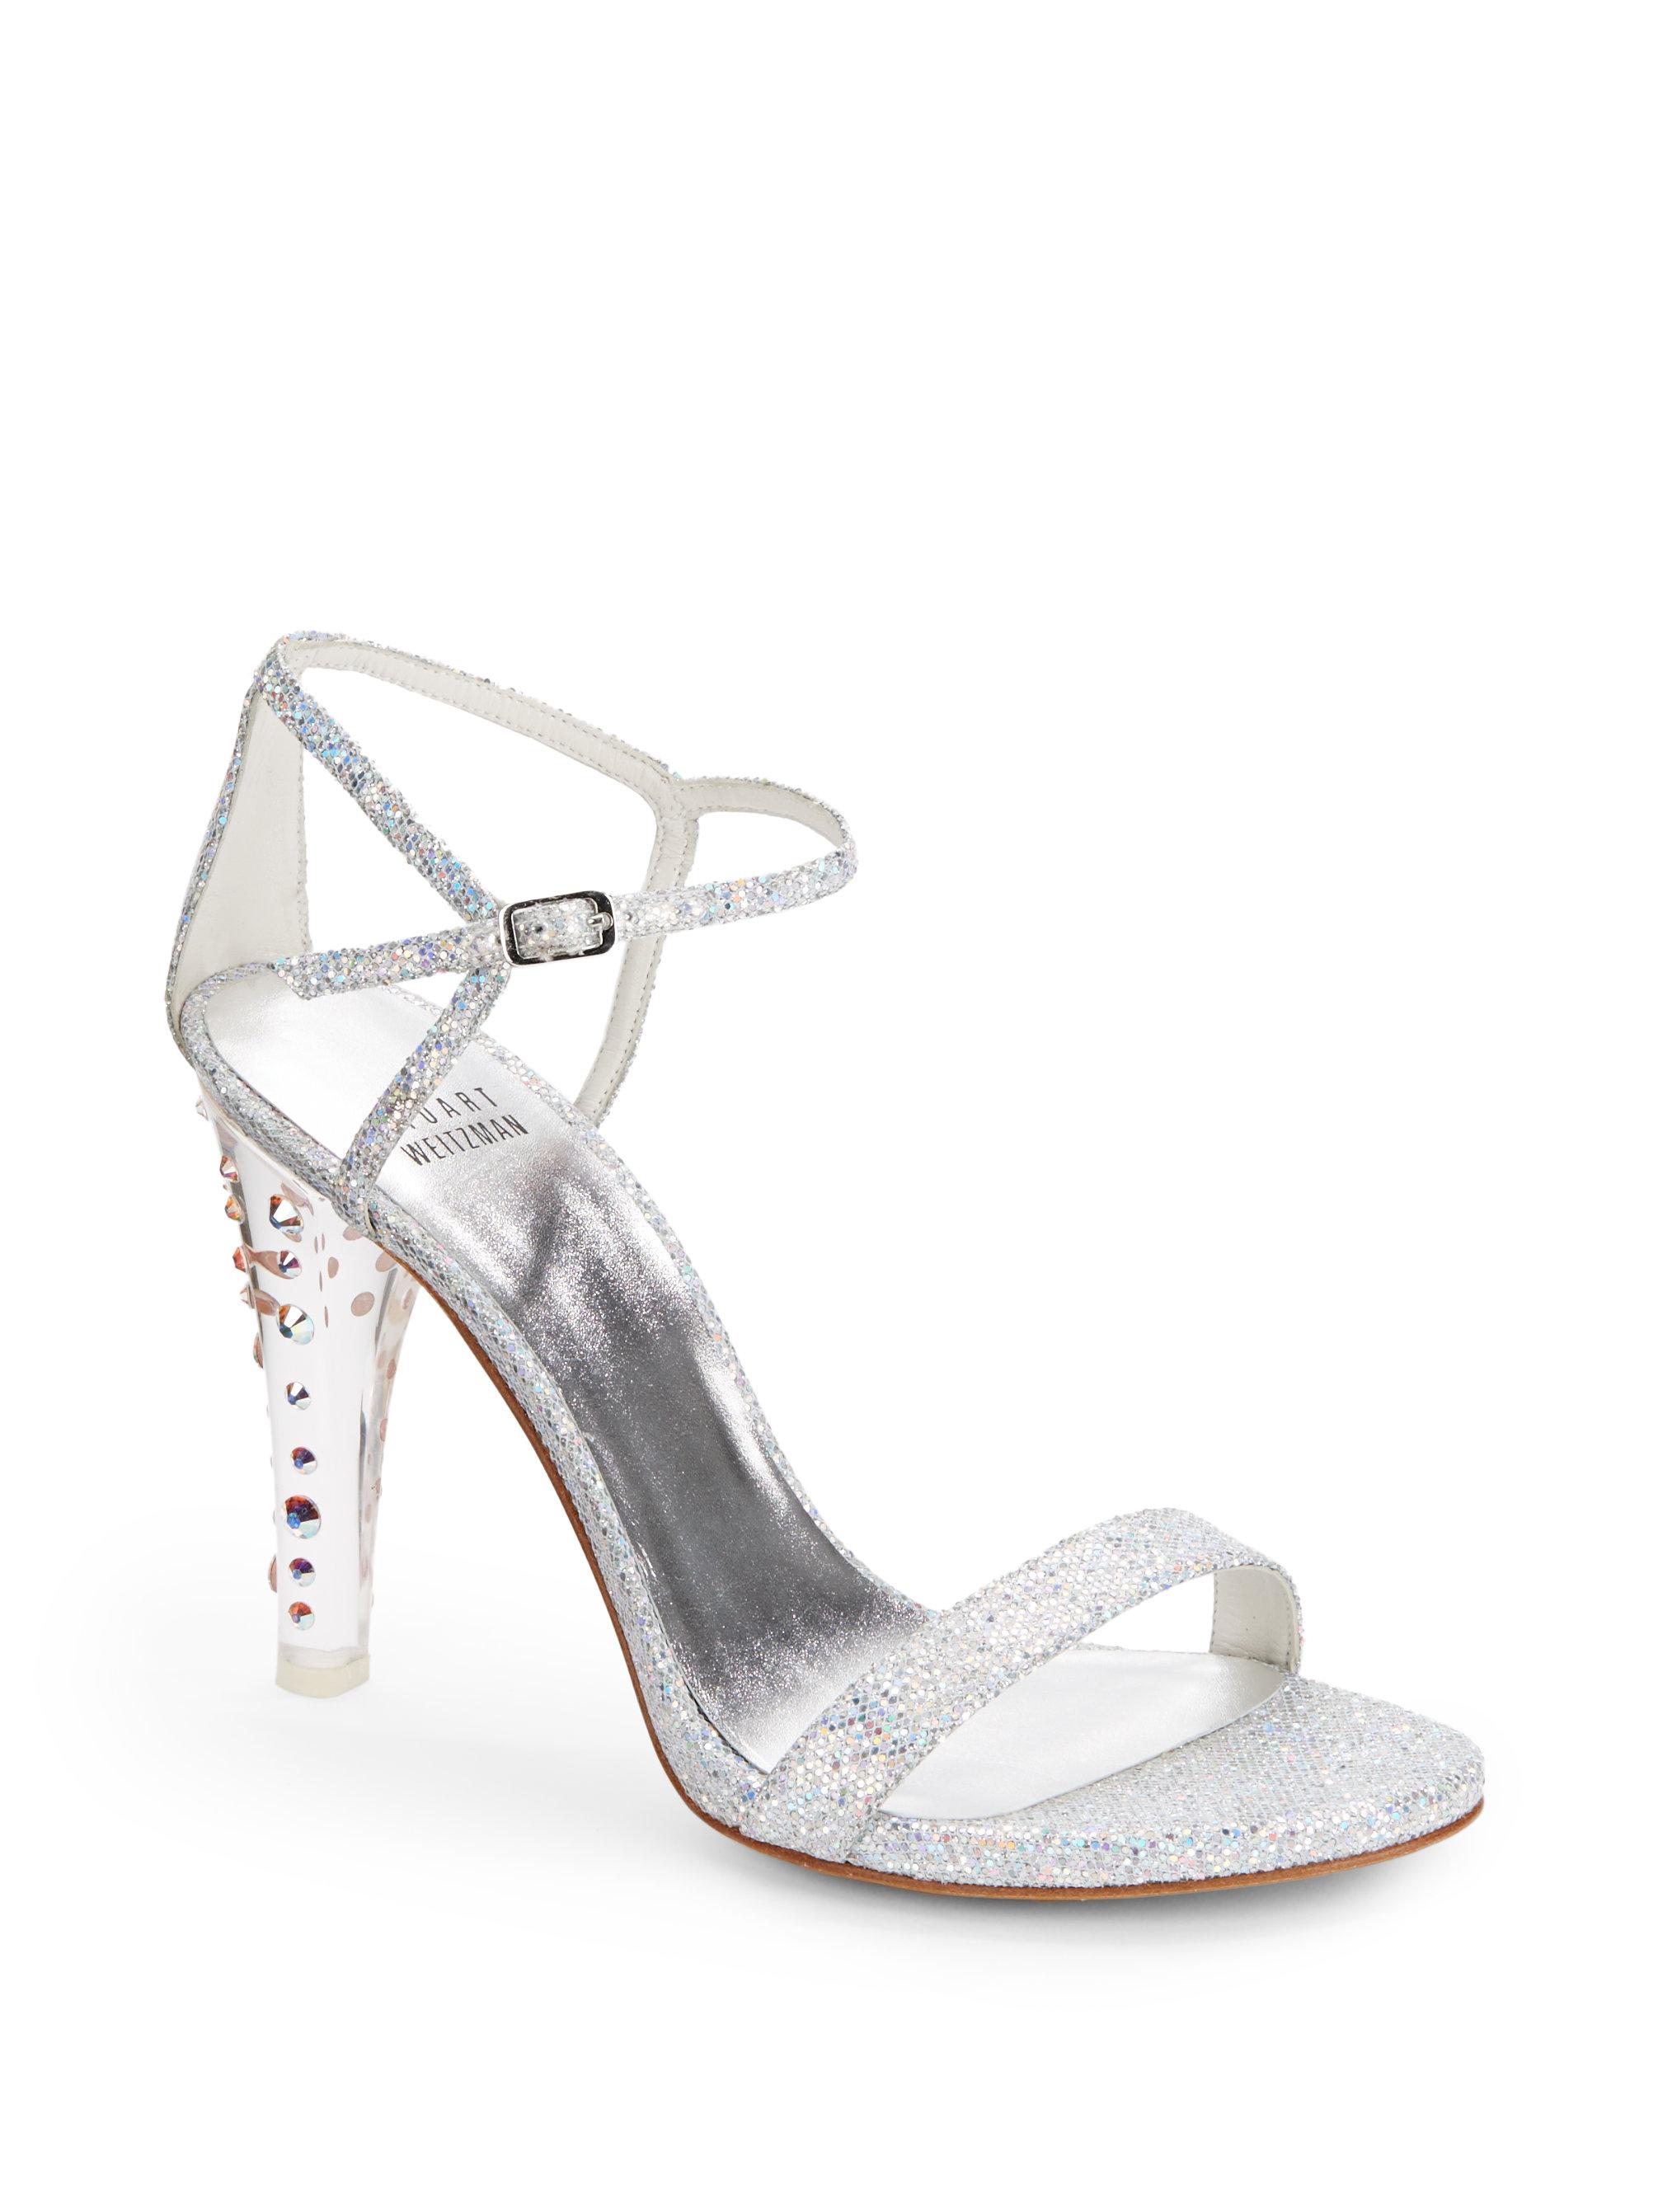 Stuart weitzman Glittony Glitter Strappy Heels Silver in Metallic ...